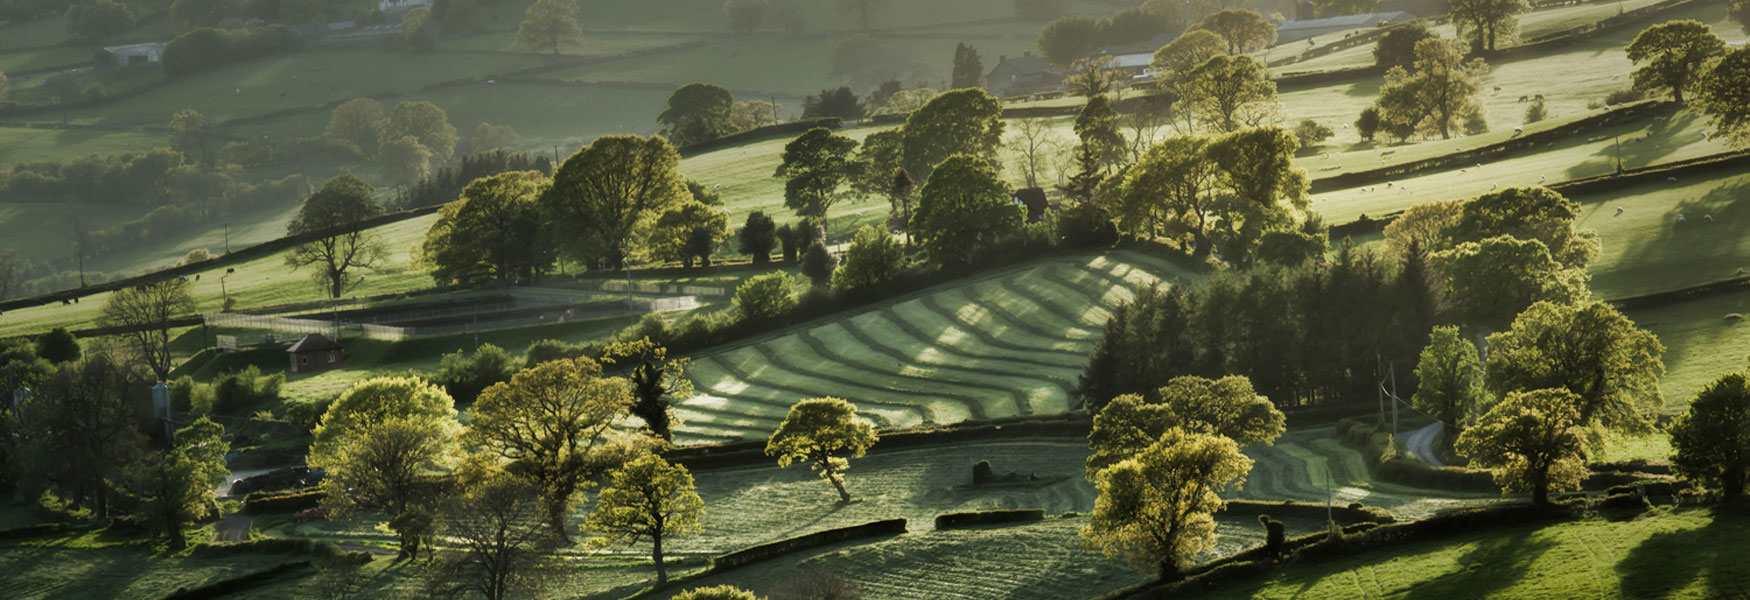 Glorious Countryside